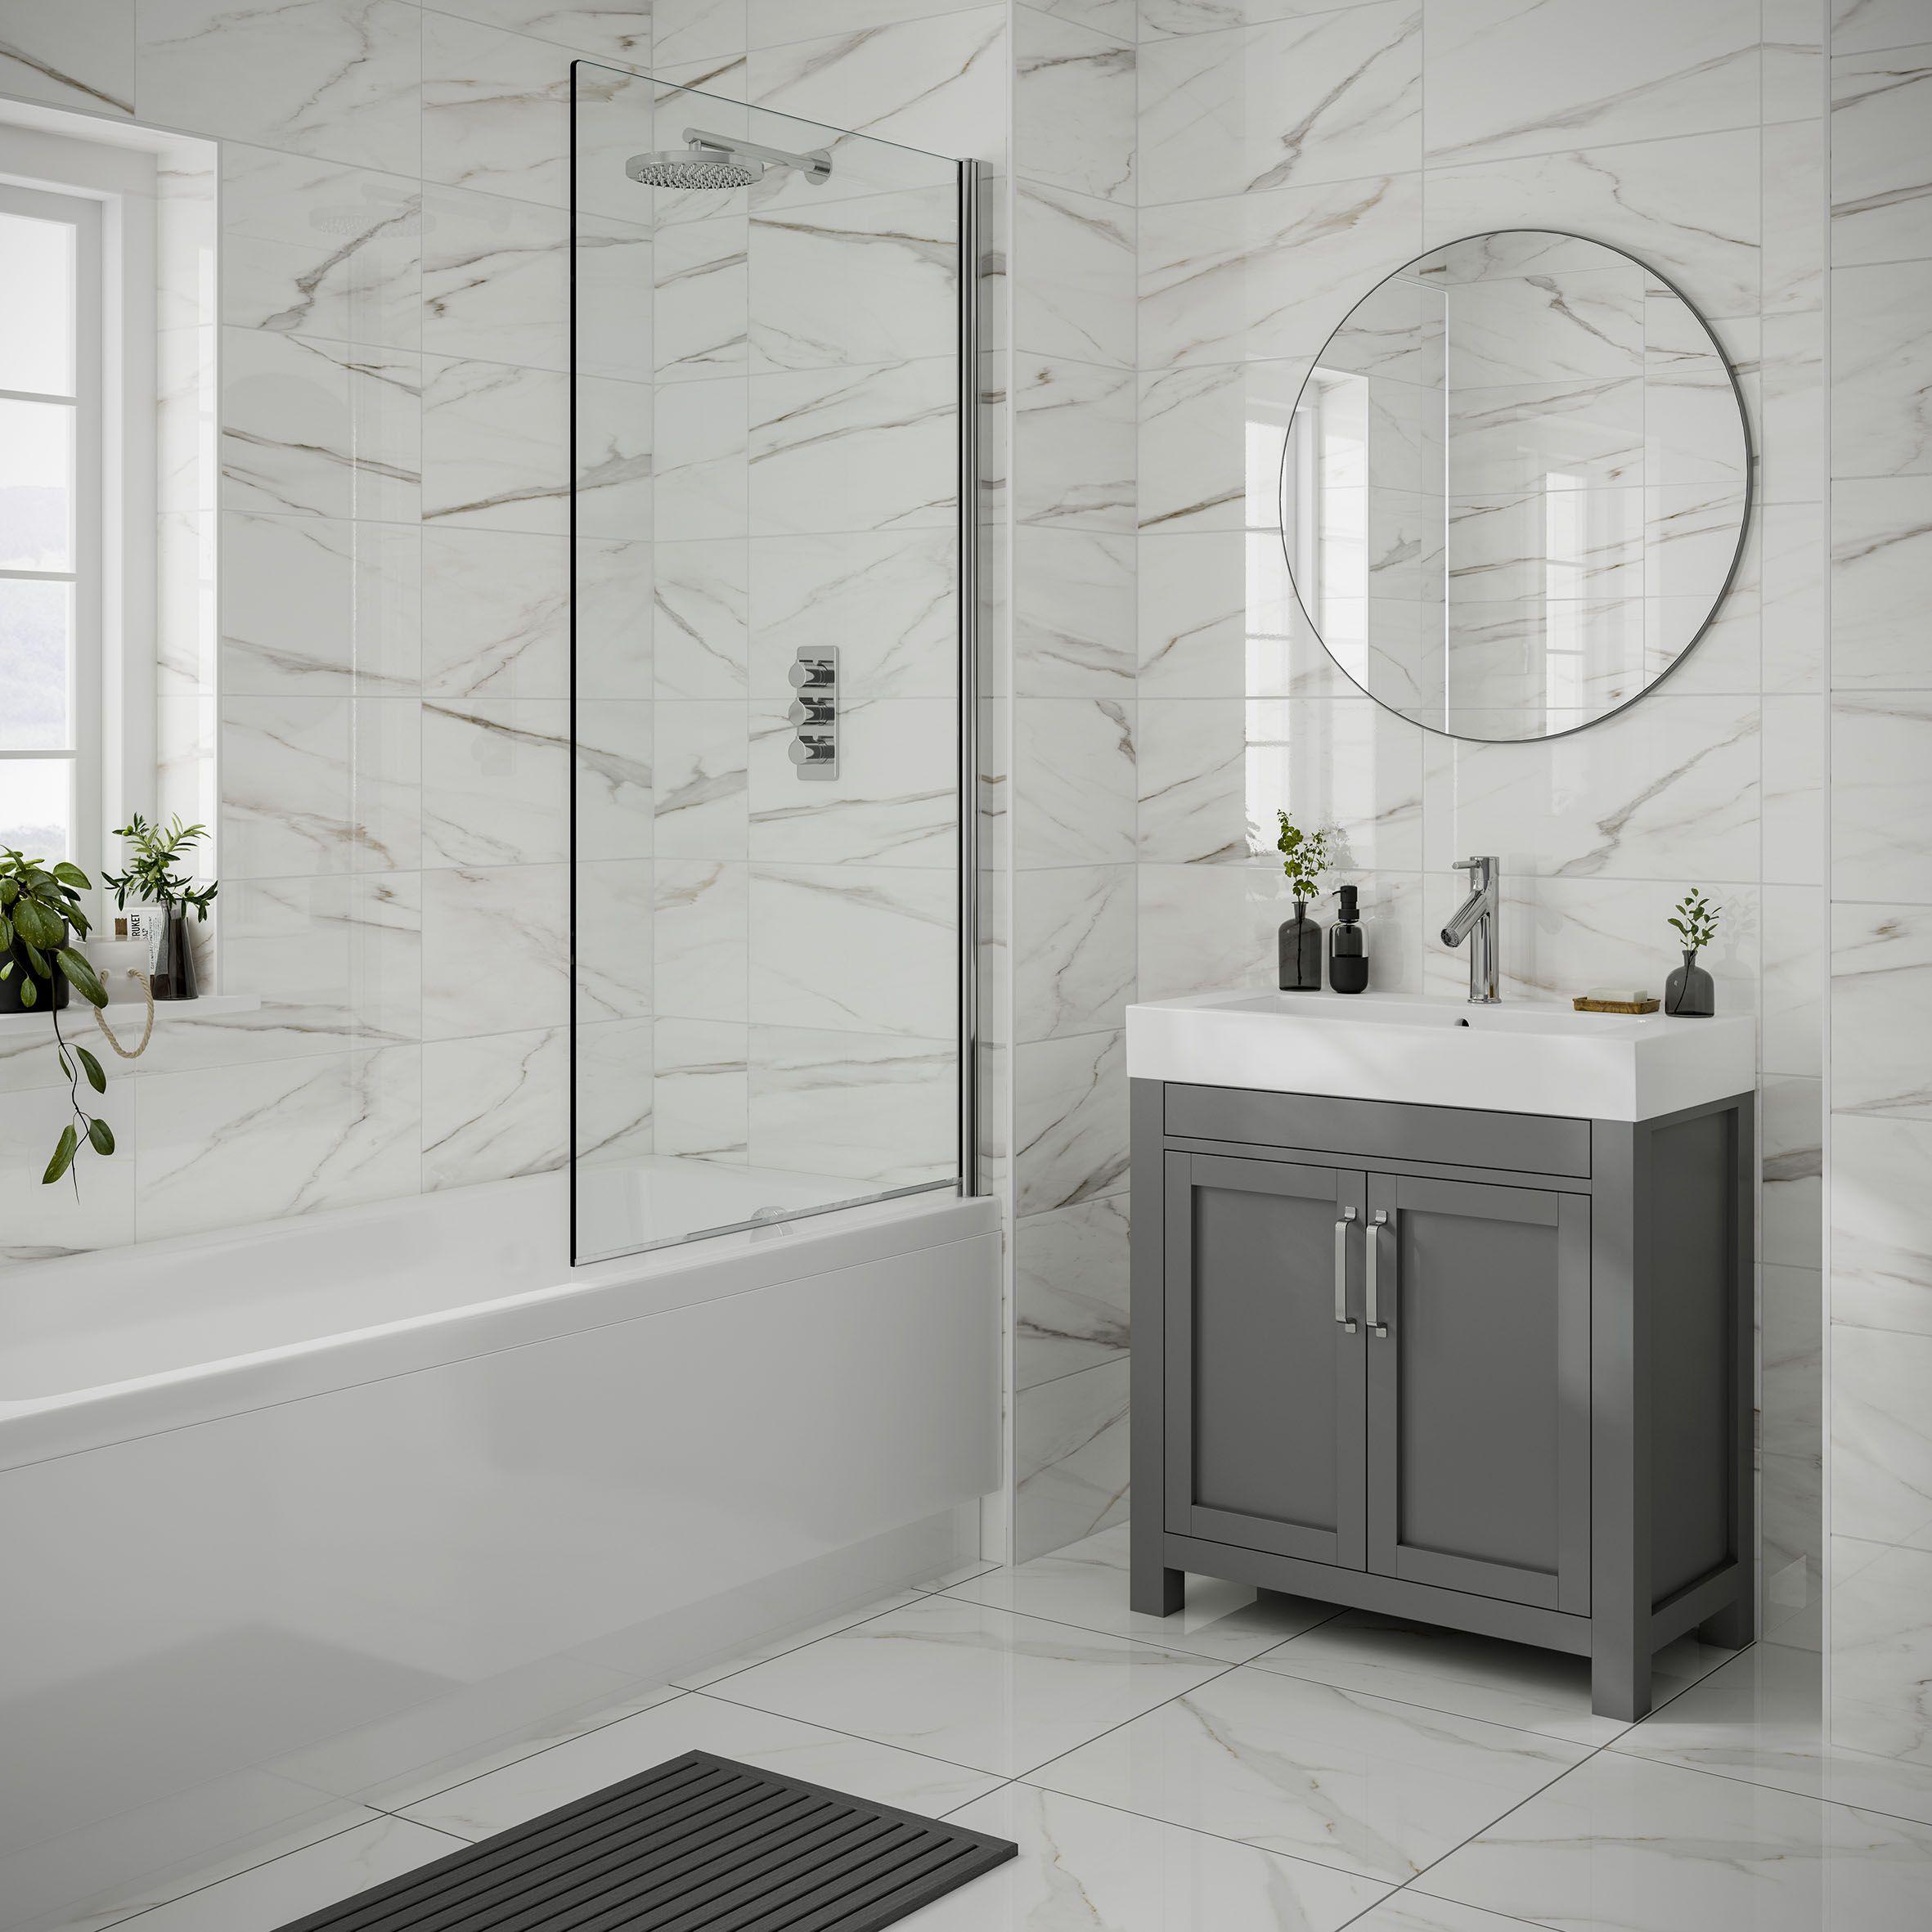 Lulworth Gloss Bathroom Wall Tile Tile Bathroom Wall And Floor Tiles